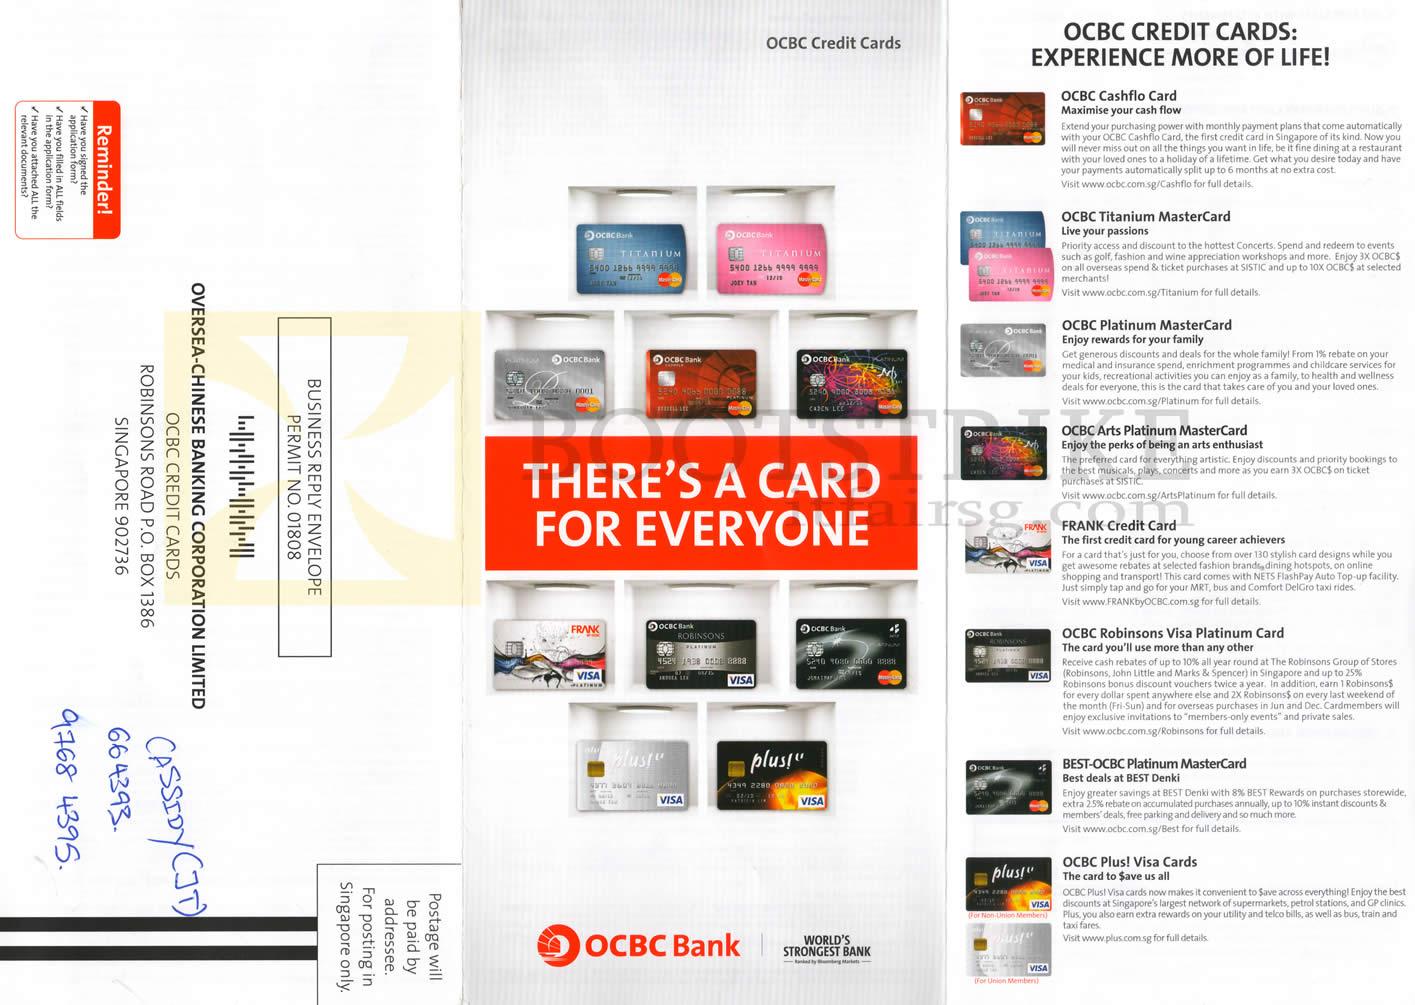 SITEX 2012 price list image brochure of OCBC Credit Cards Features Cashflo, Titanium MasterCards, Platinum, Arts, Frank, Robinsons Visa, Best, Plus